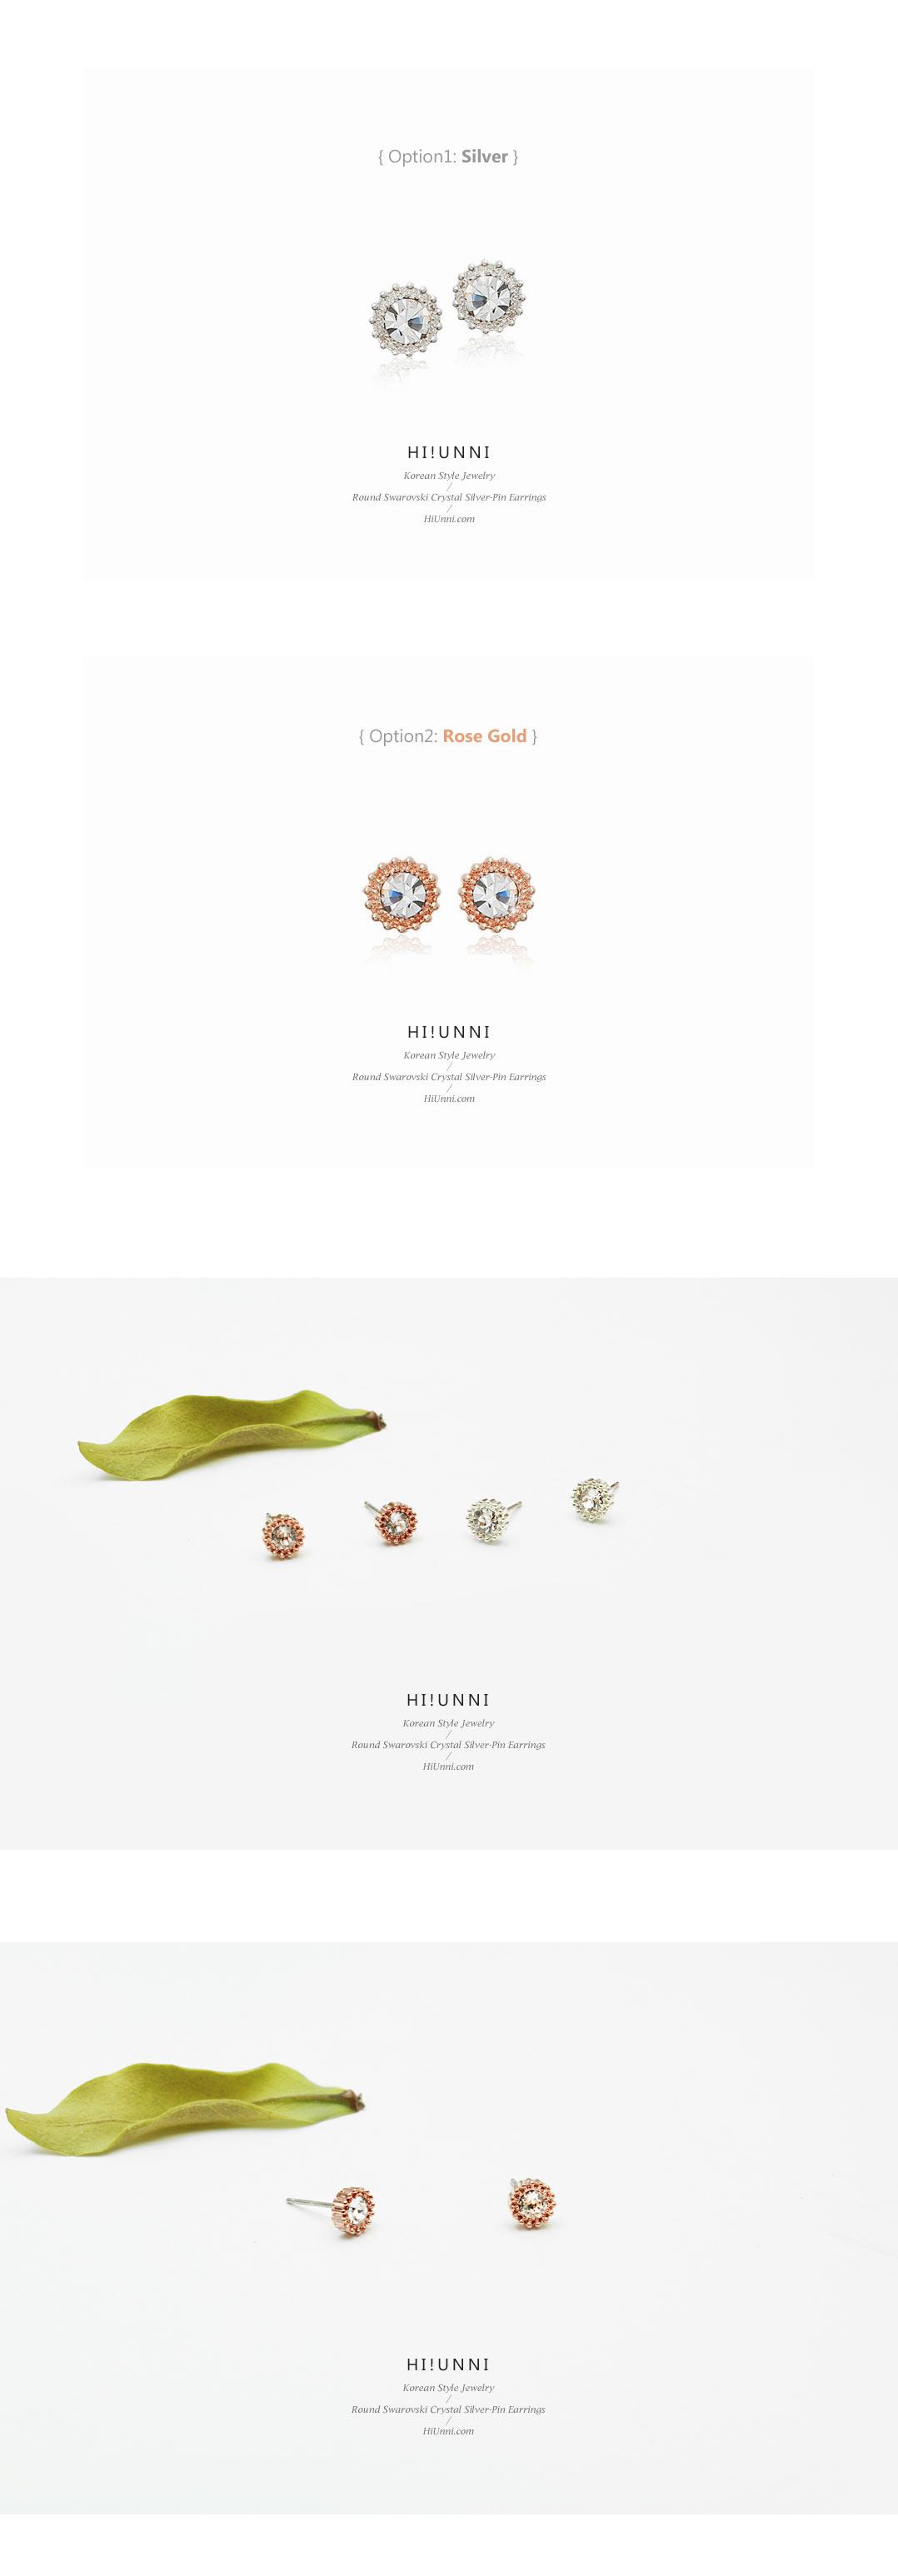 accessories_ear_stud_earrings_korean_asian_style_jewelry_Nickel-Free_titanium_swarovski-_crystal_round_925_silver_3